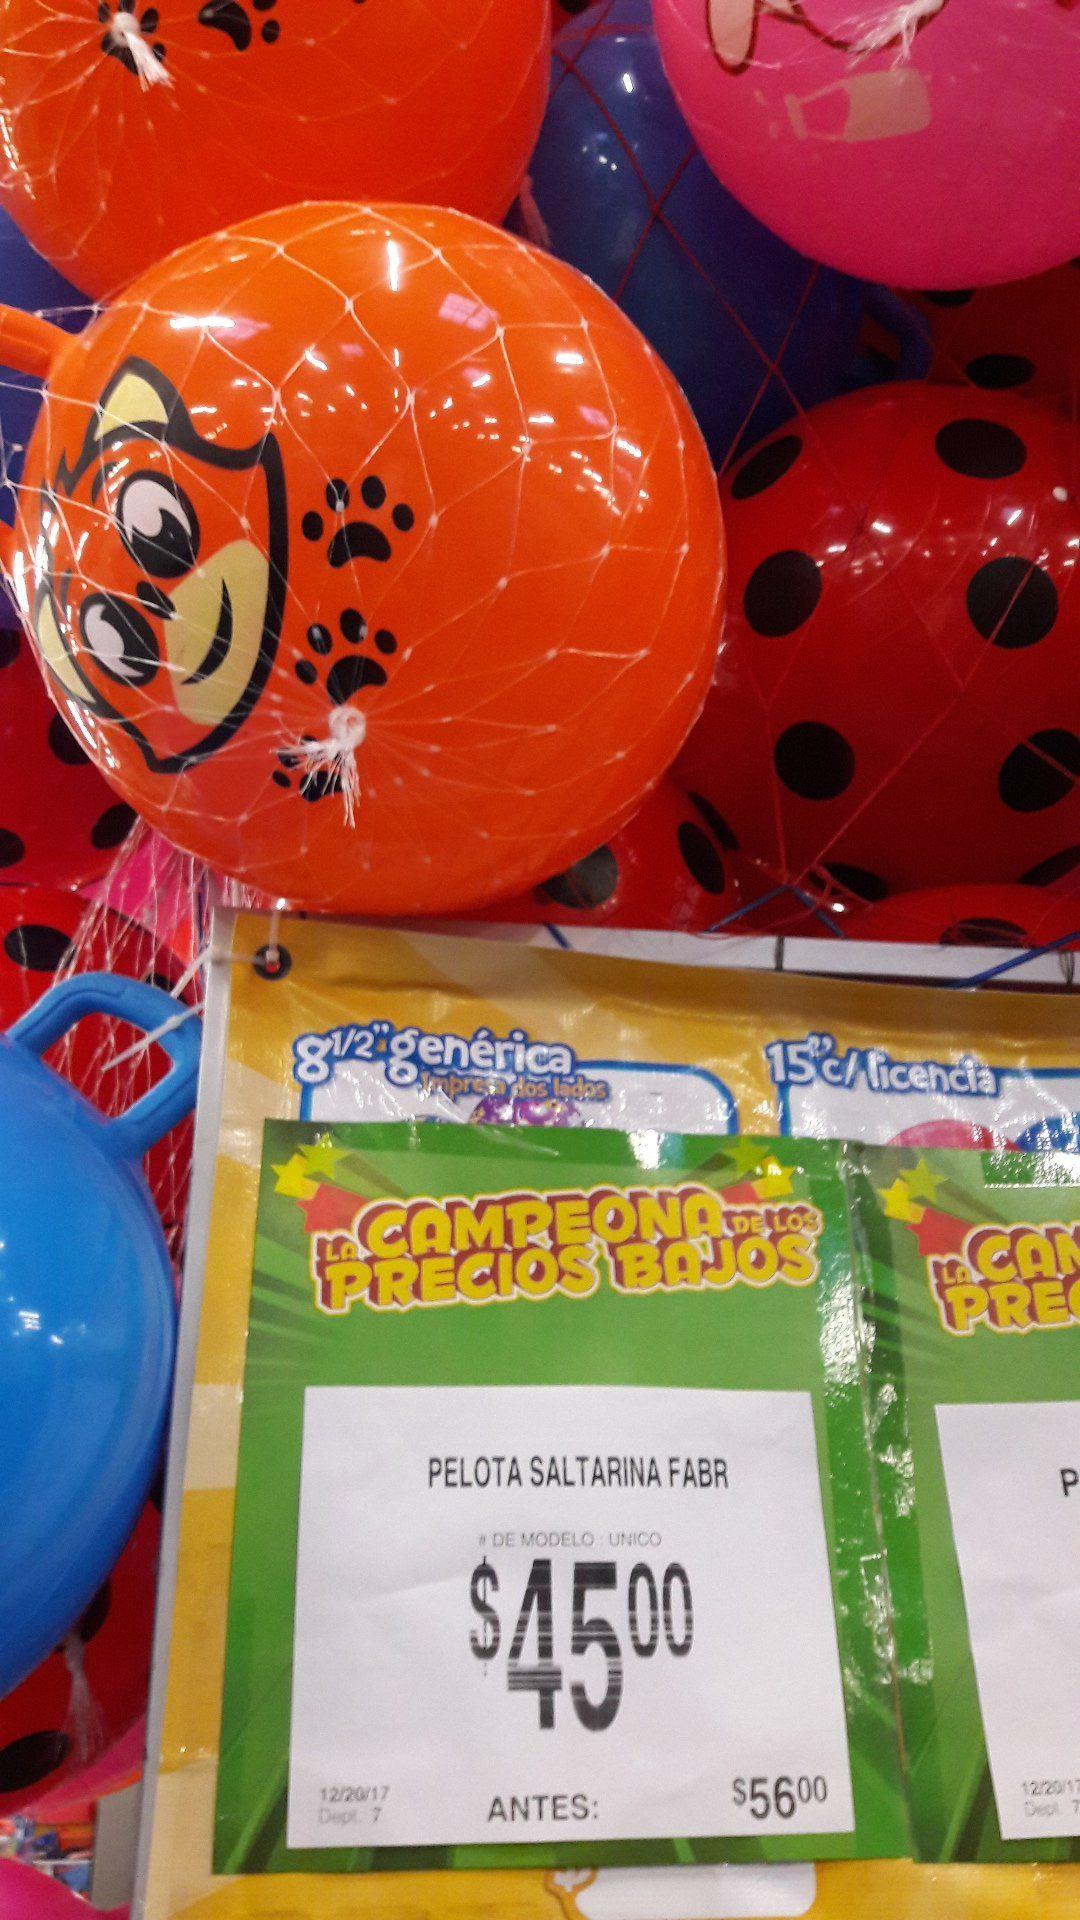 Bodega Aurrerá: Ofertas juguetes (ej. pelota saltarina a $45.00)